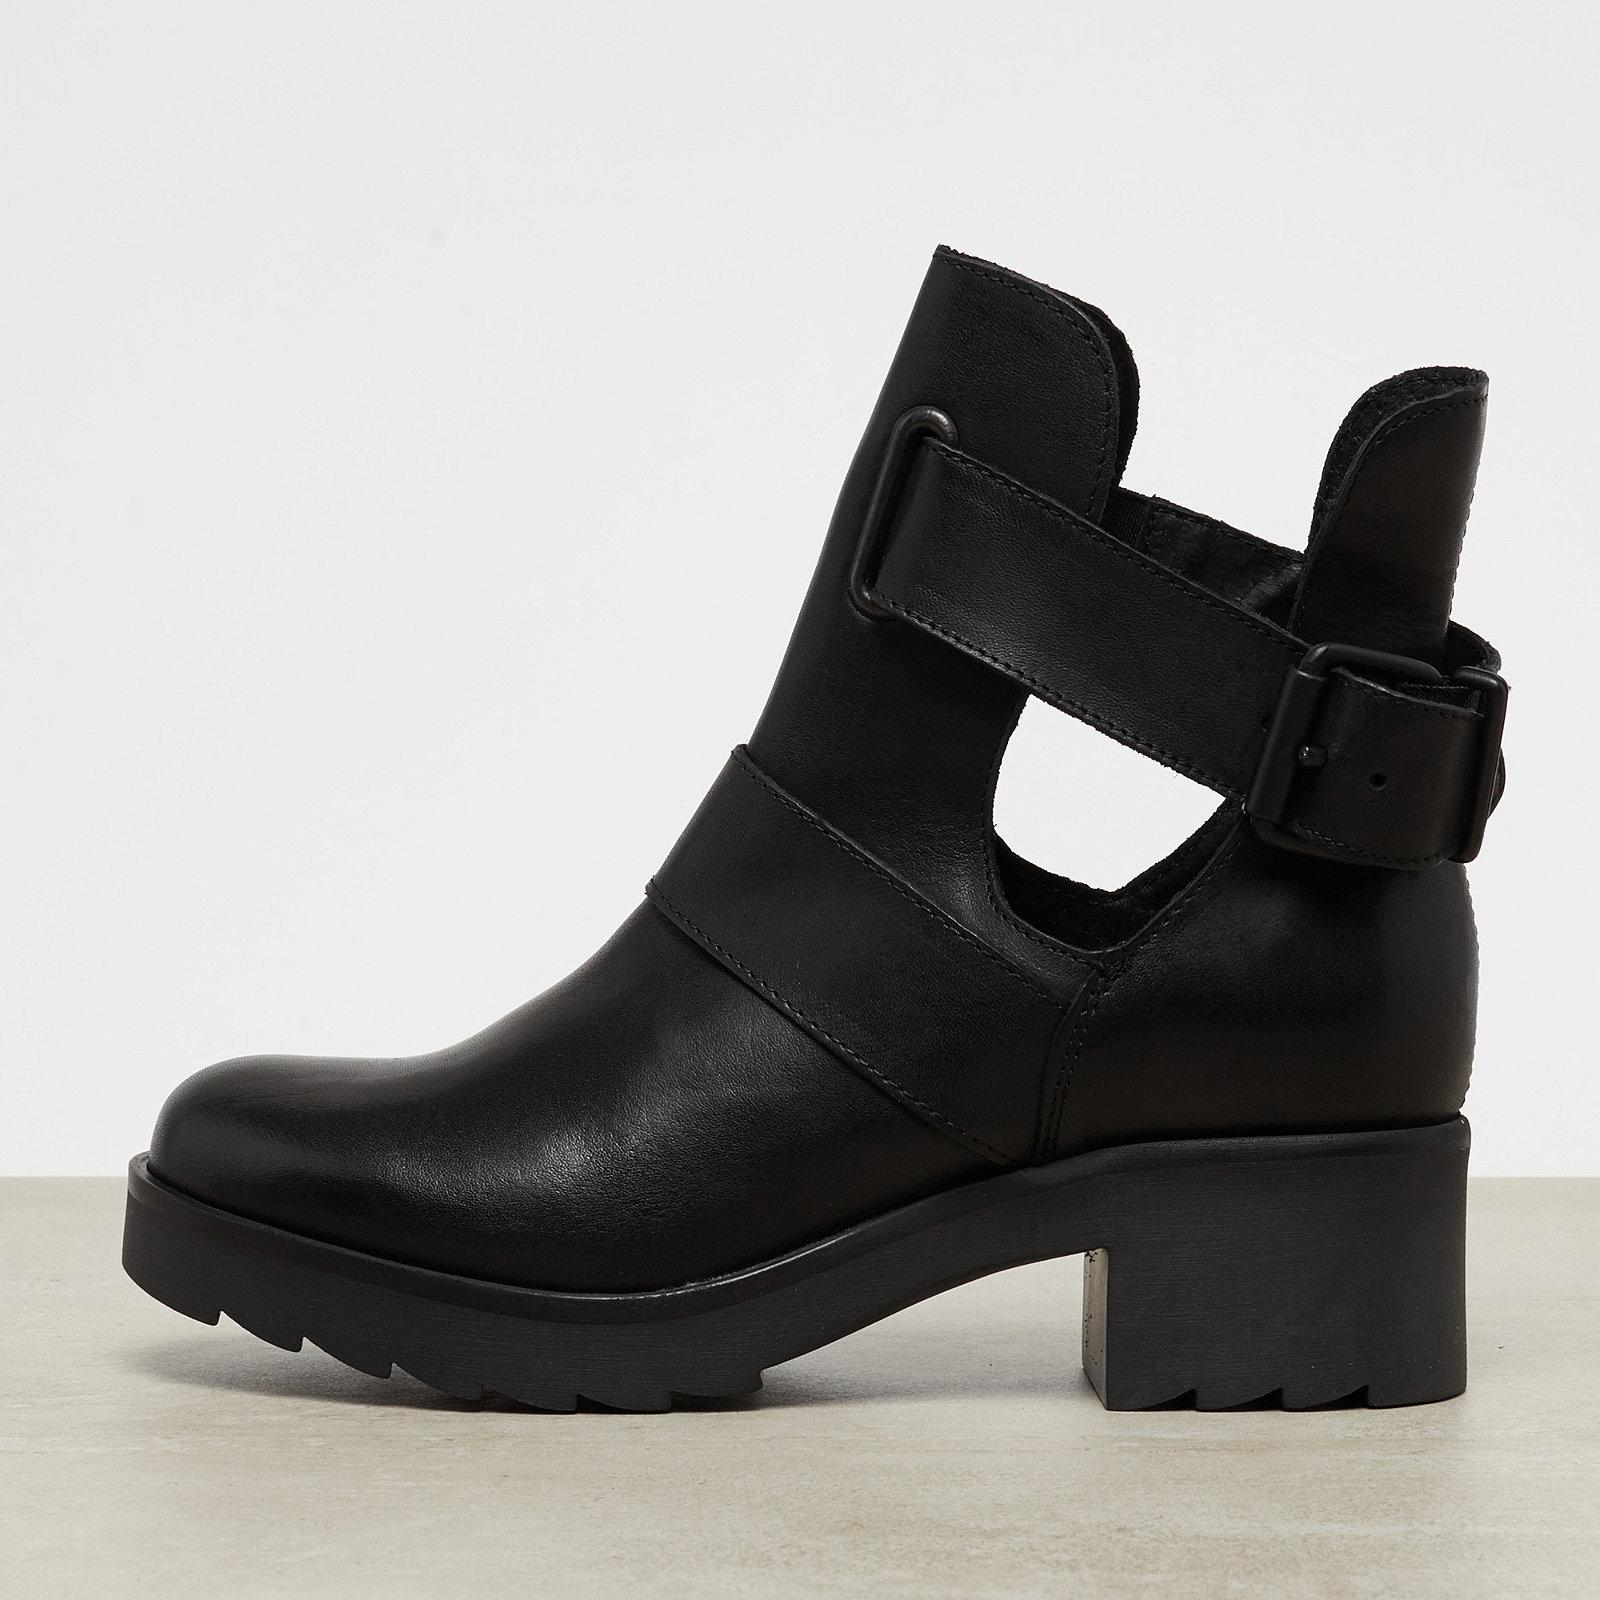 ONYGO Sascha Black Schuhe Versankdkostenfrei